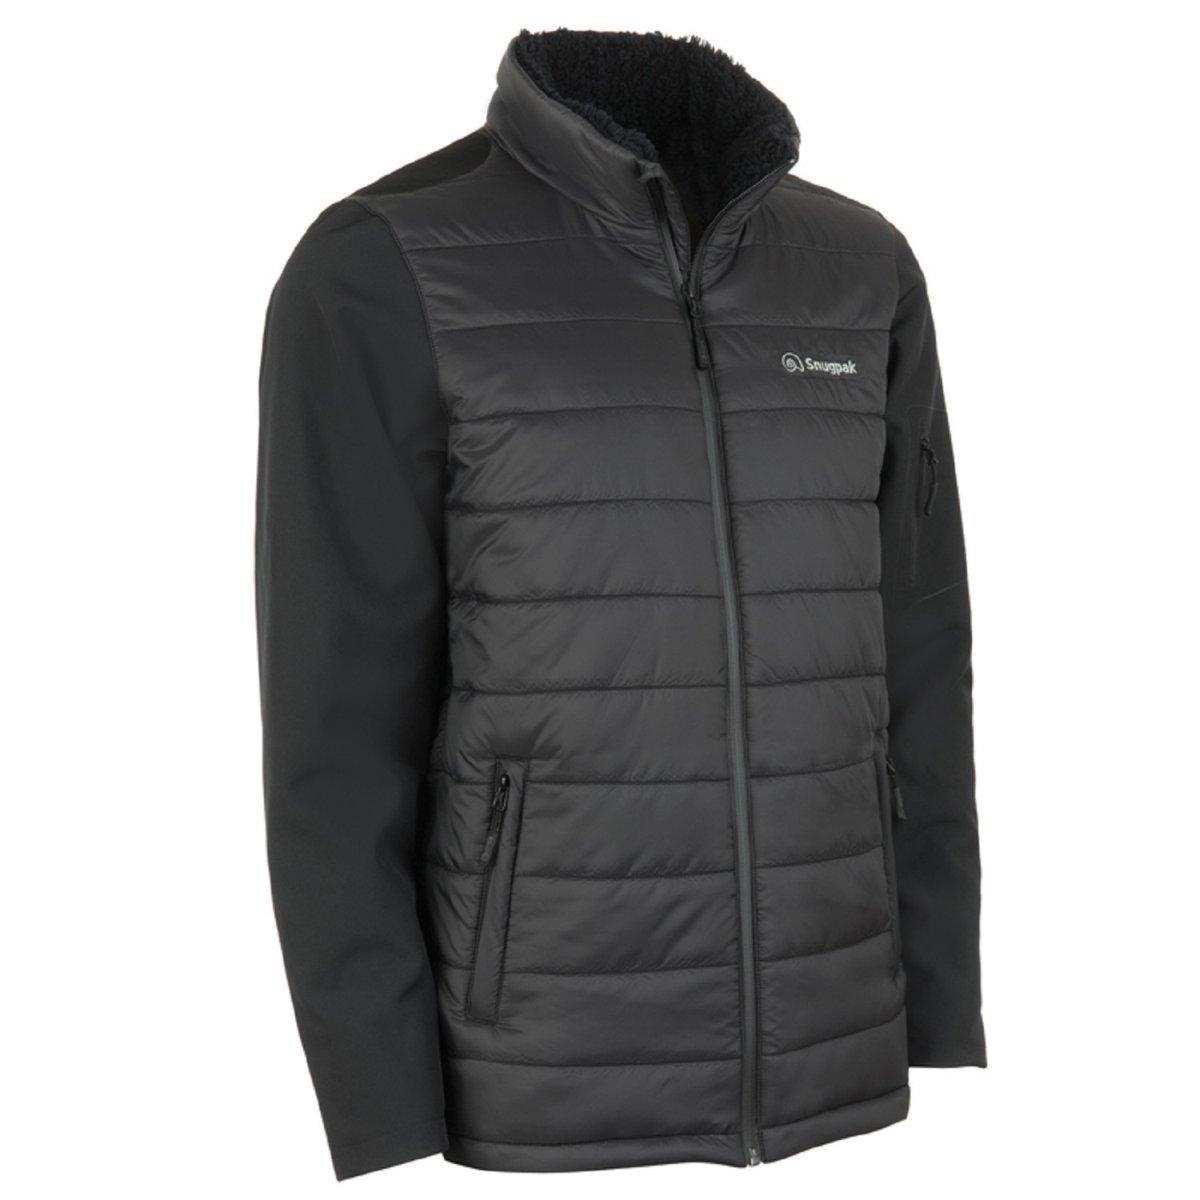 Snugpak - Fusion Insulated Jacket - Black - M